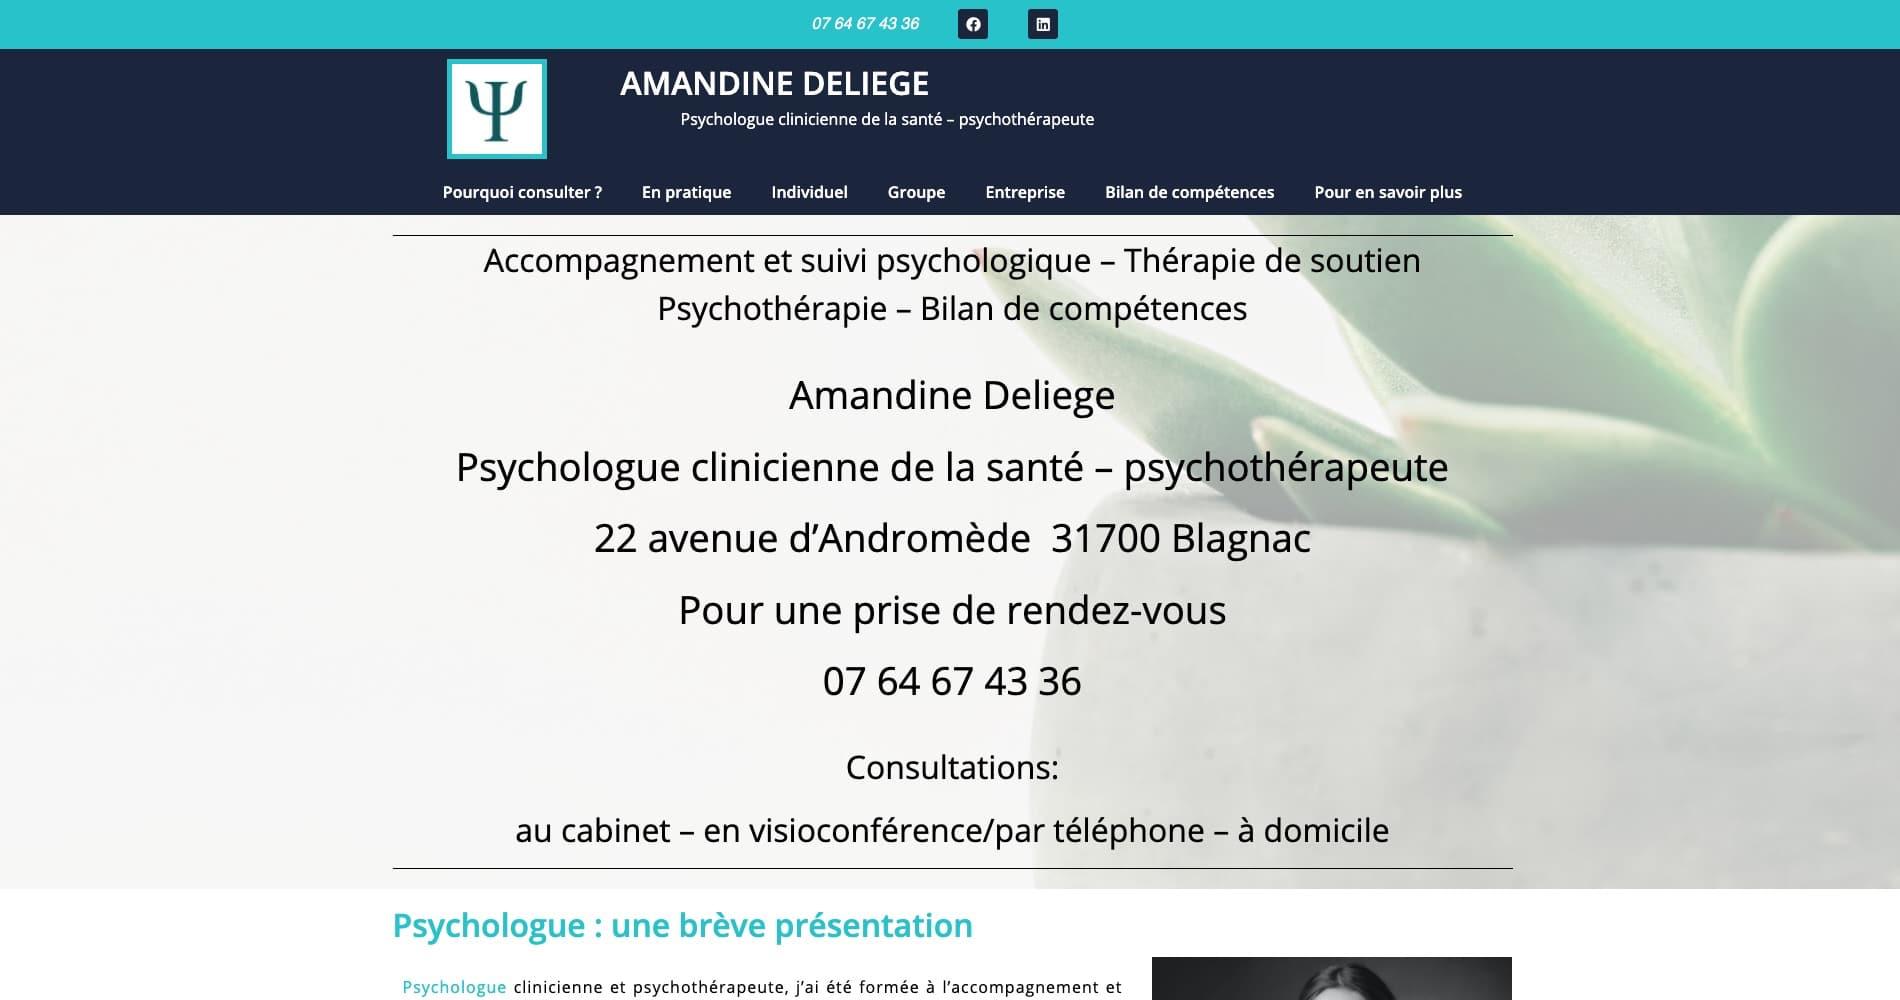 Amandine Deliege